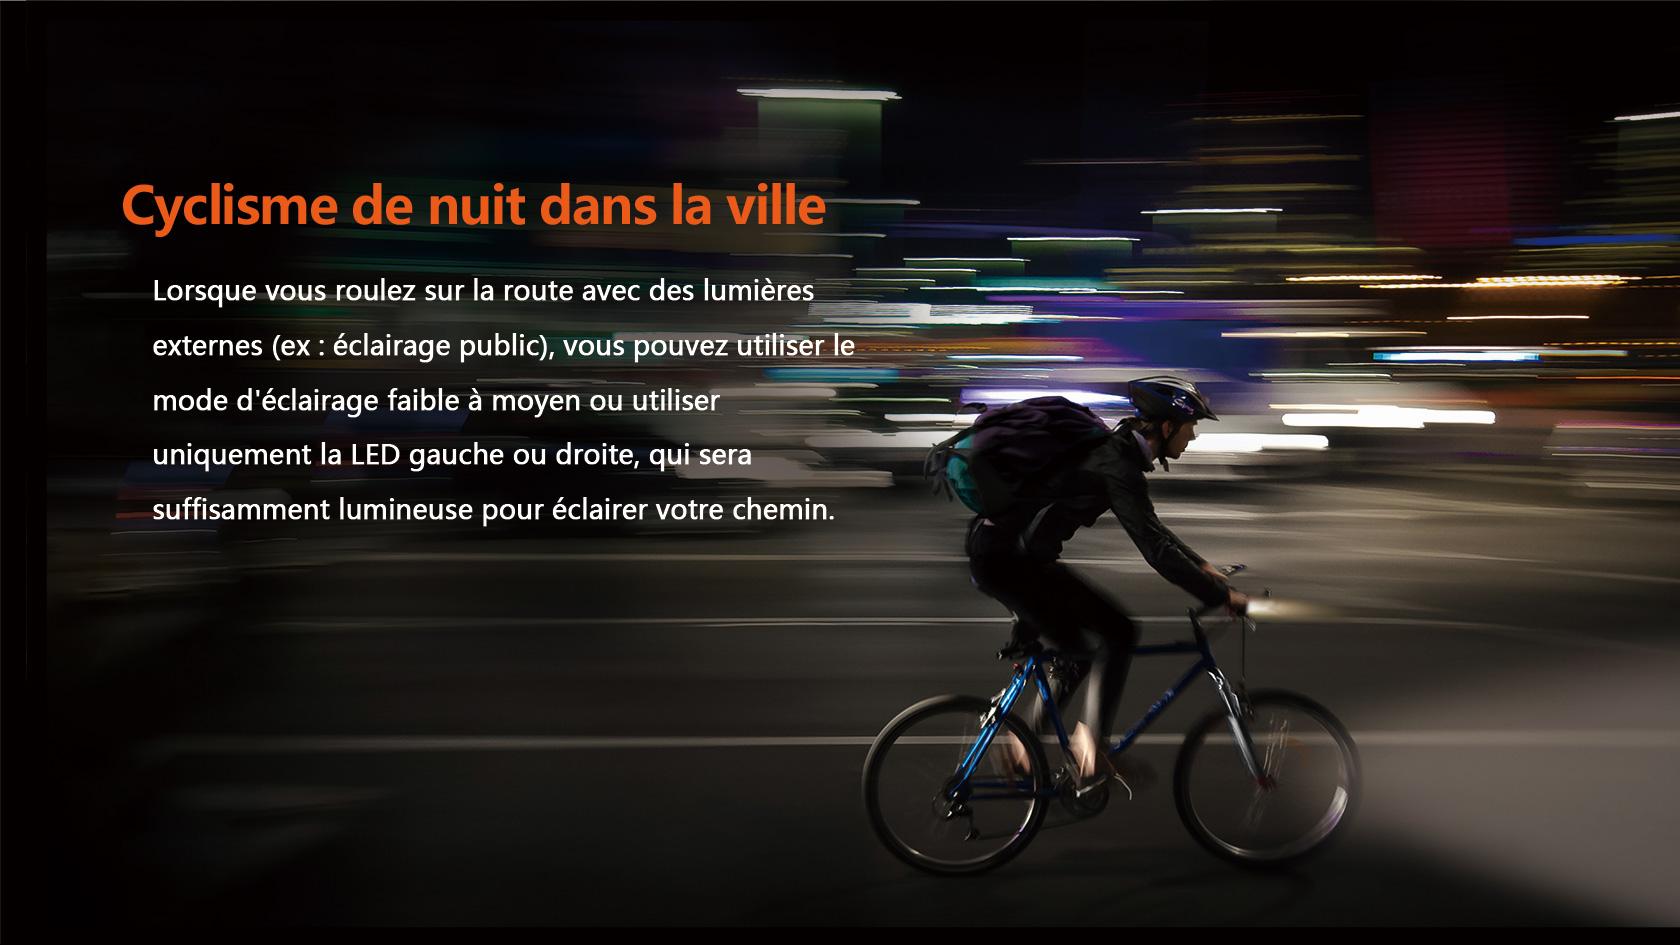 lampe avant vélo lumineux